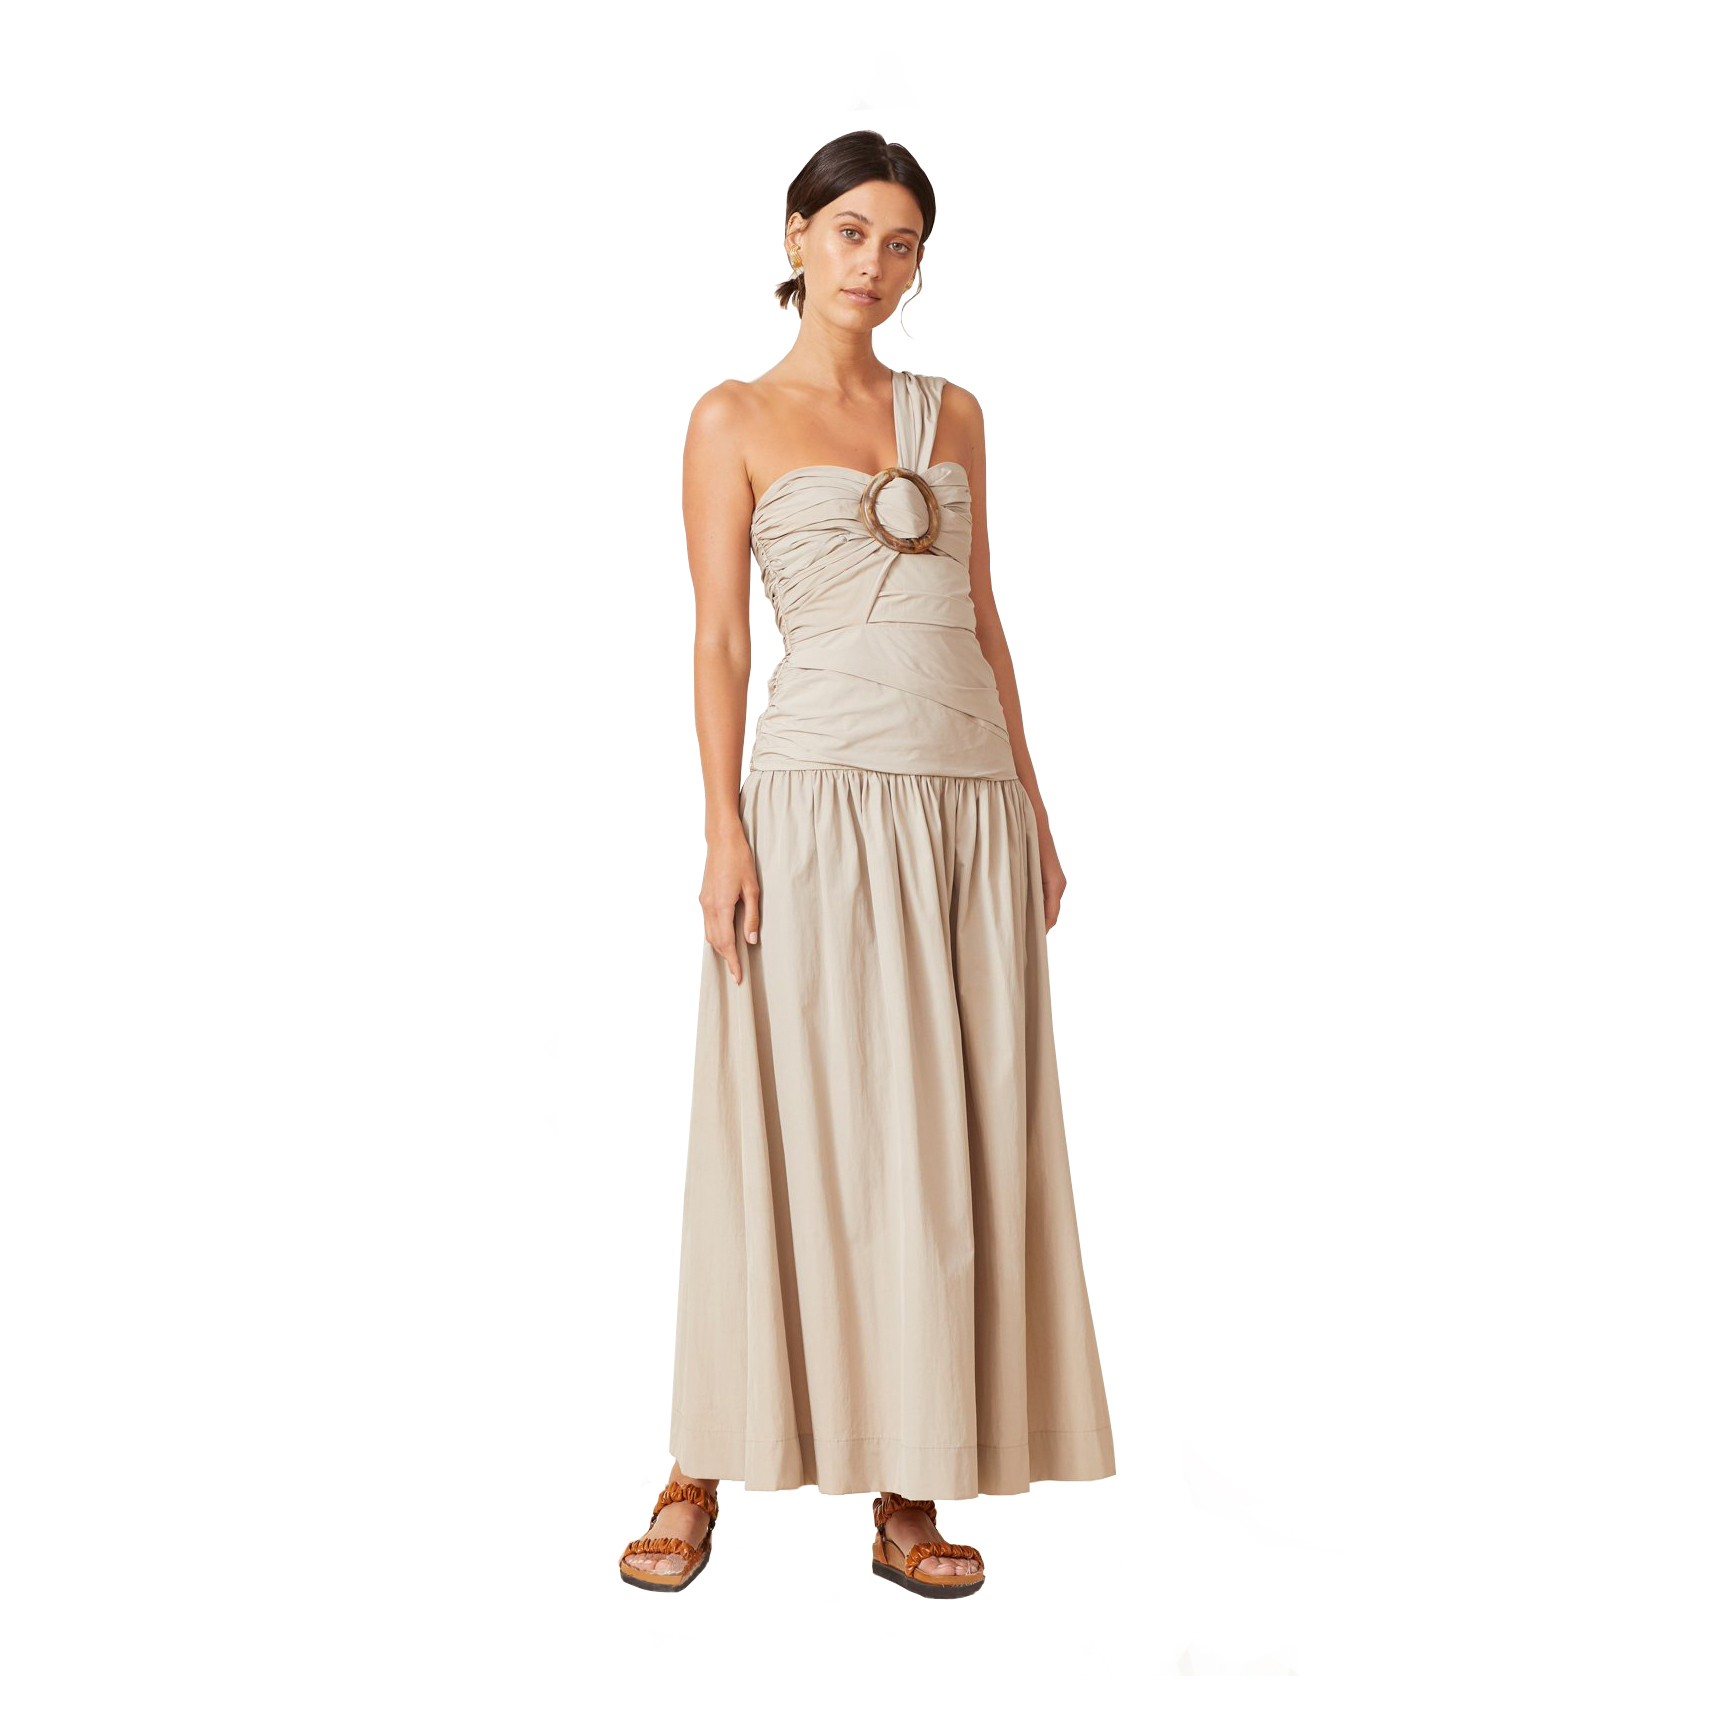 Bec + Bridge Nixie Dress